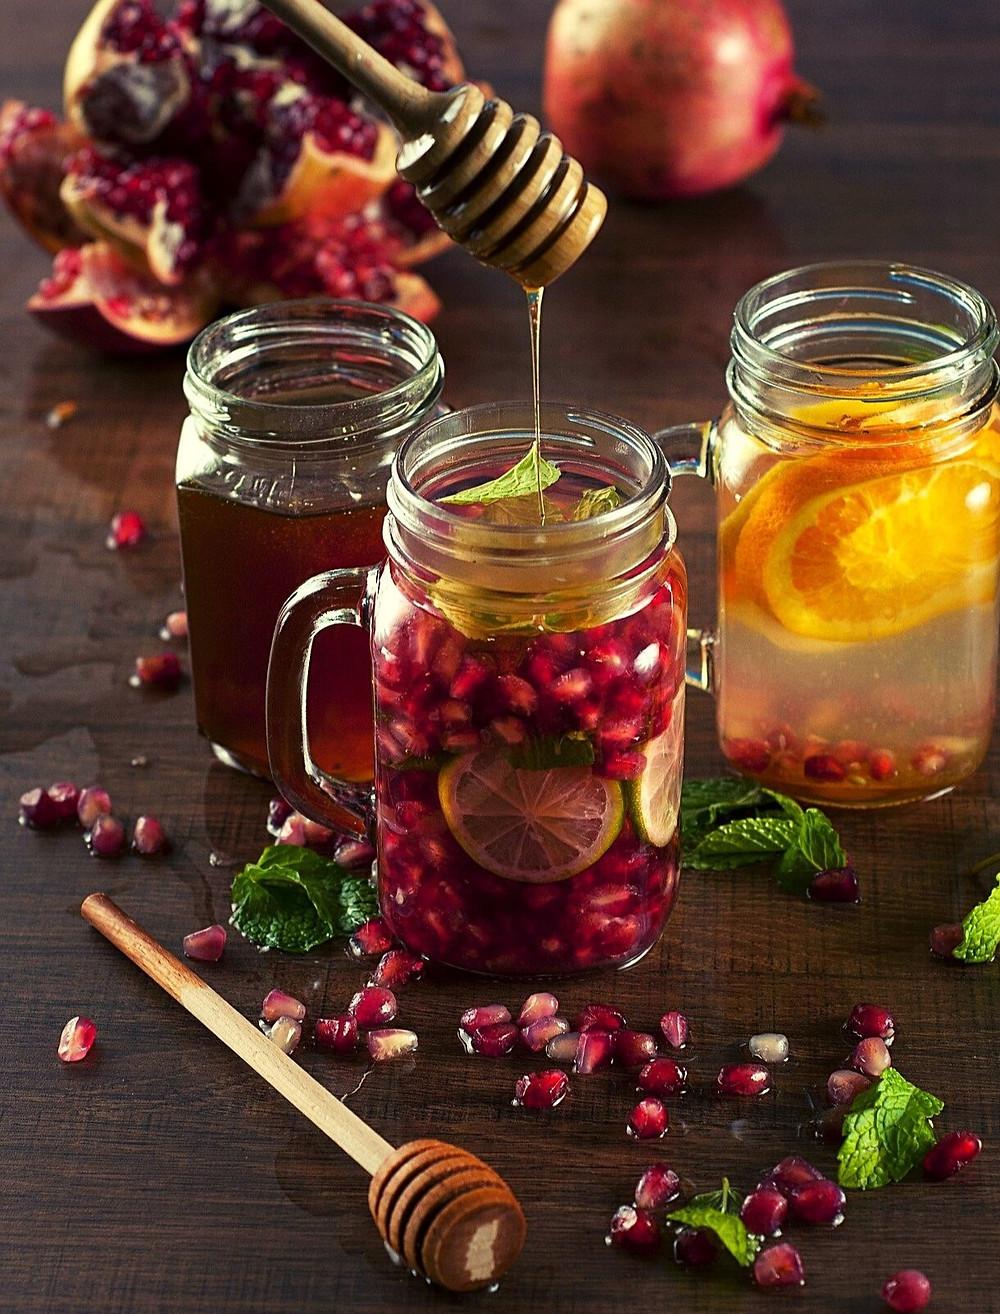 pomegranate-jar-marmalade-red-tasty-diy-easy